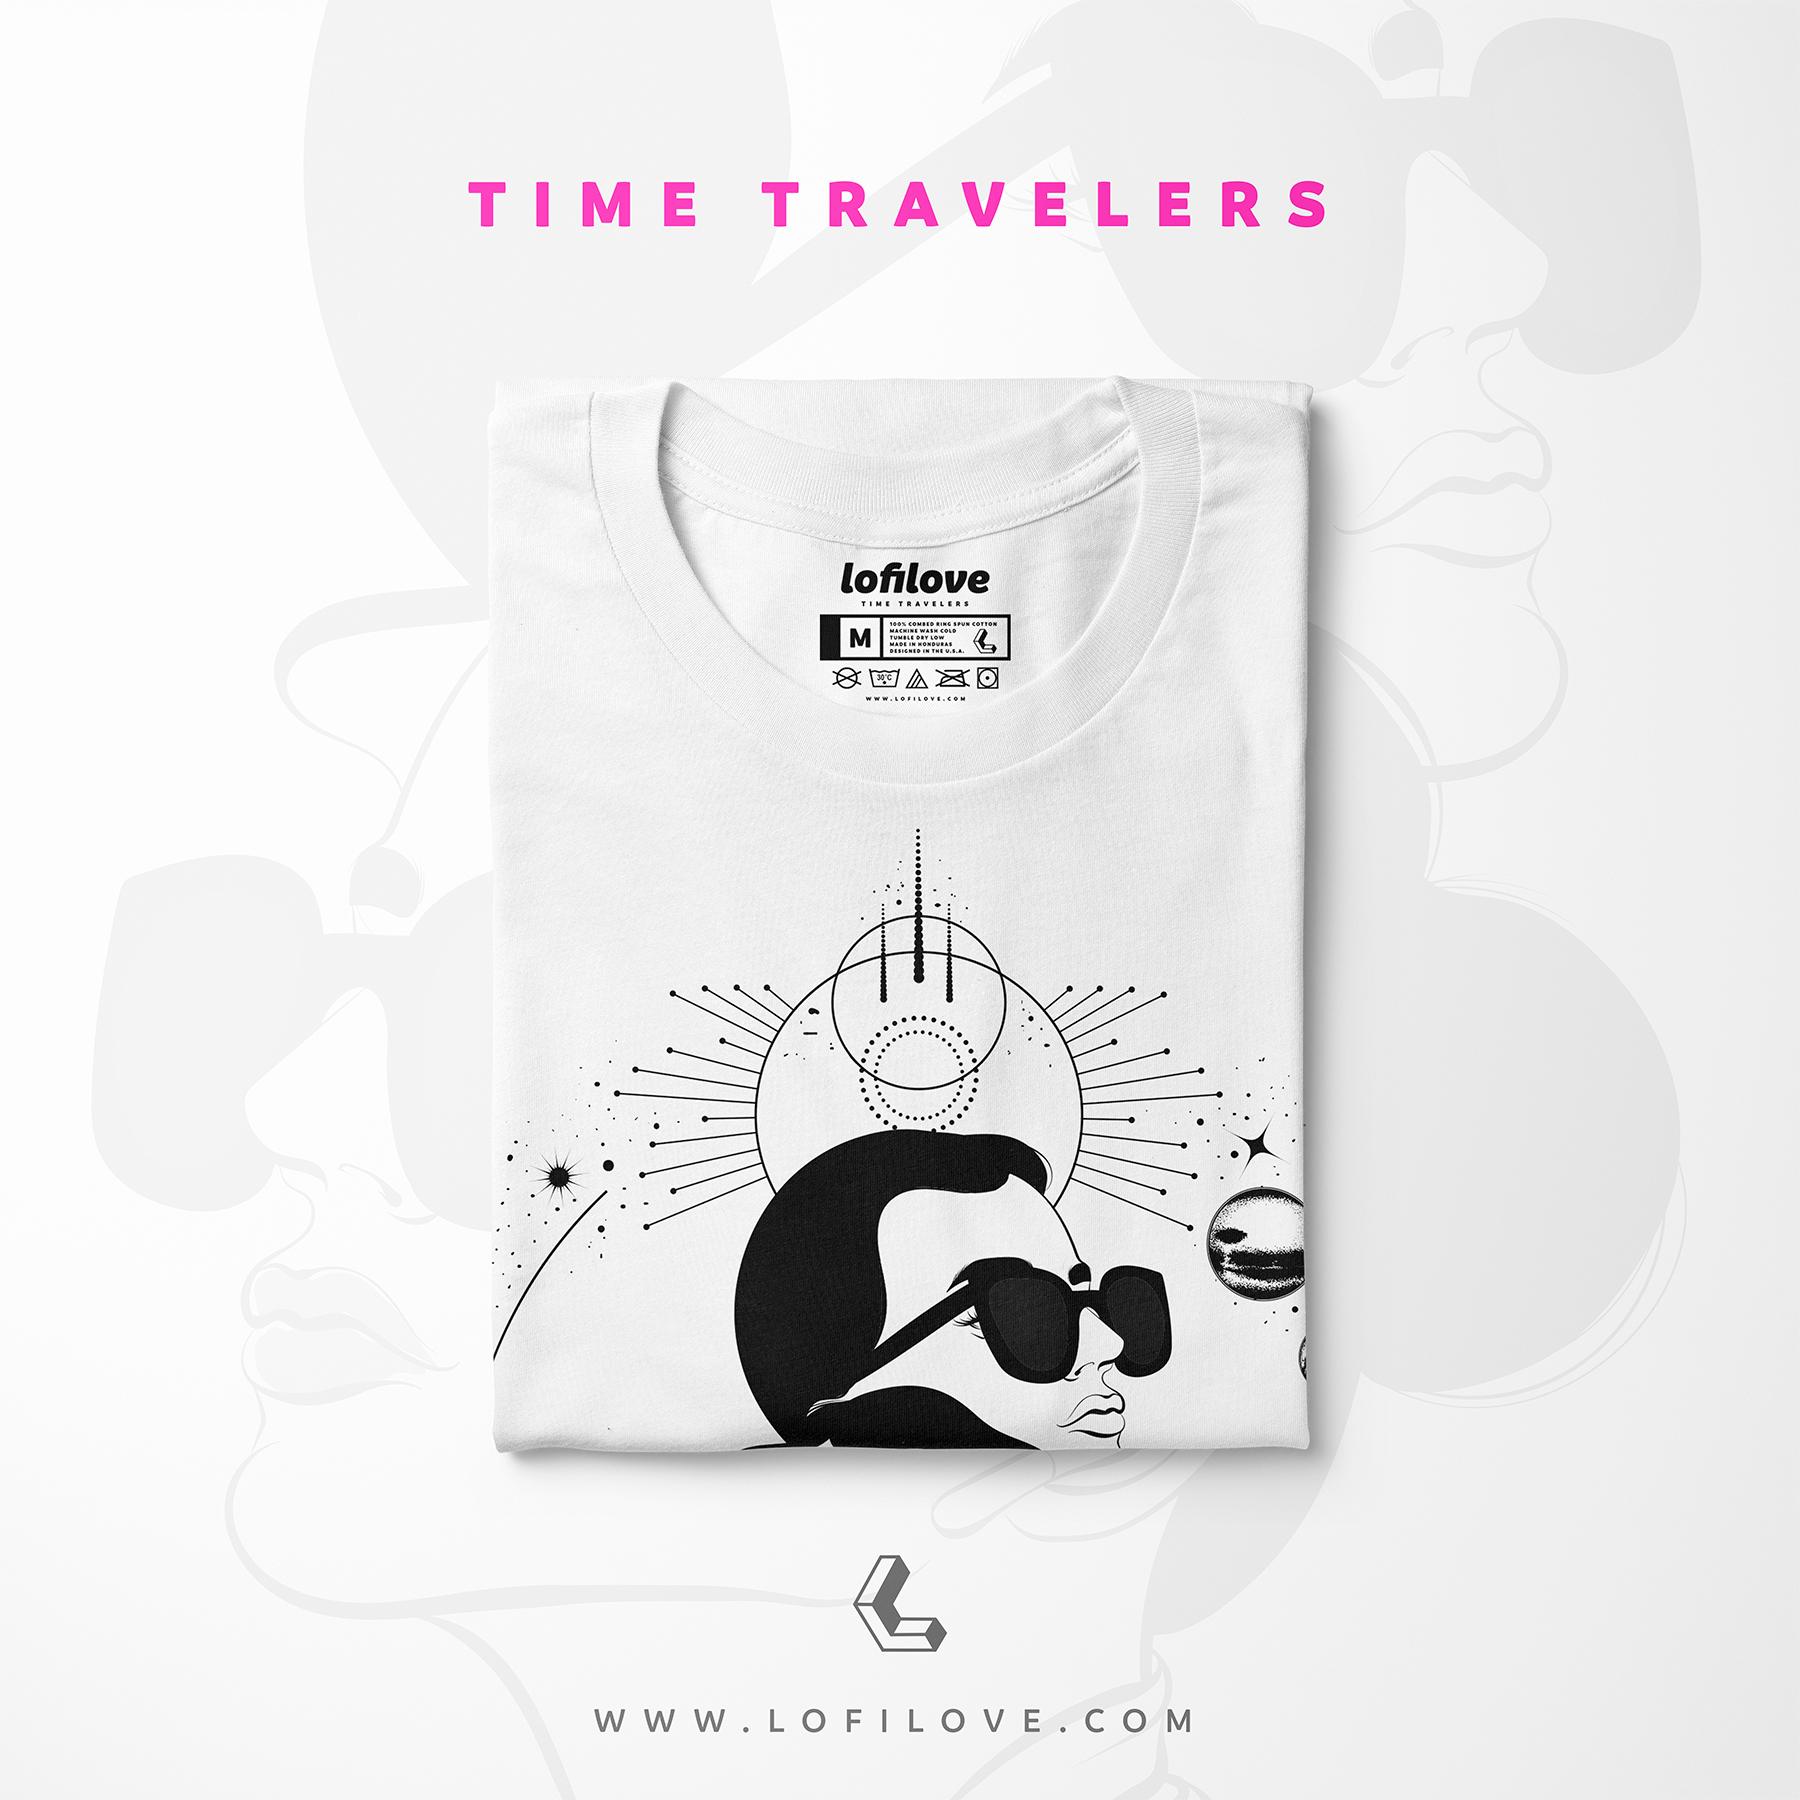 lofilove-time-travelers-tee-2